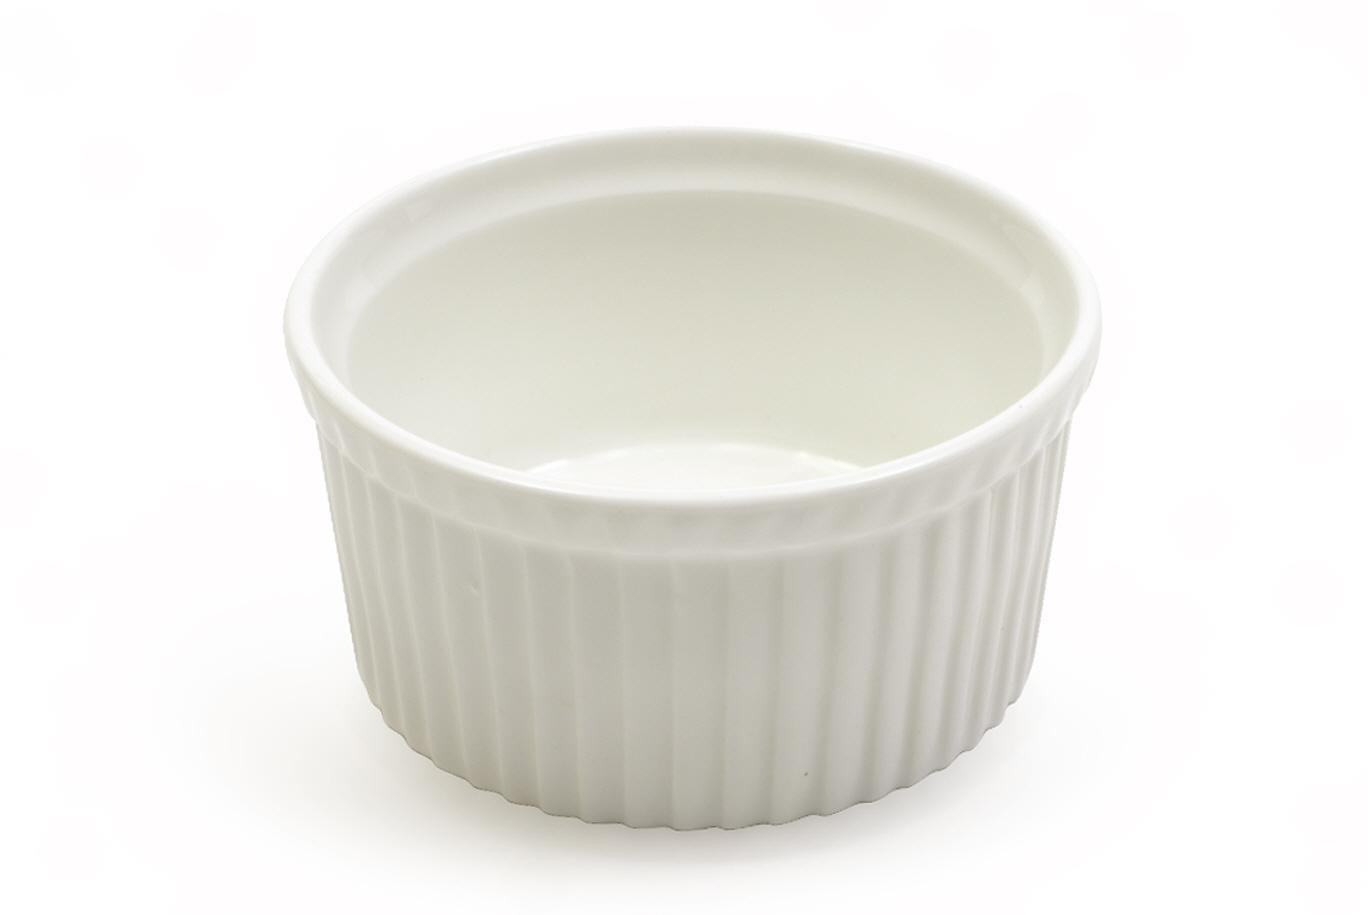 Zapékací Ramekin White Basics 8,5 cm - Maxwell&Williams